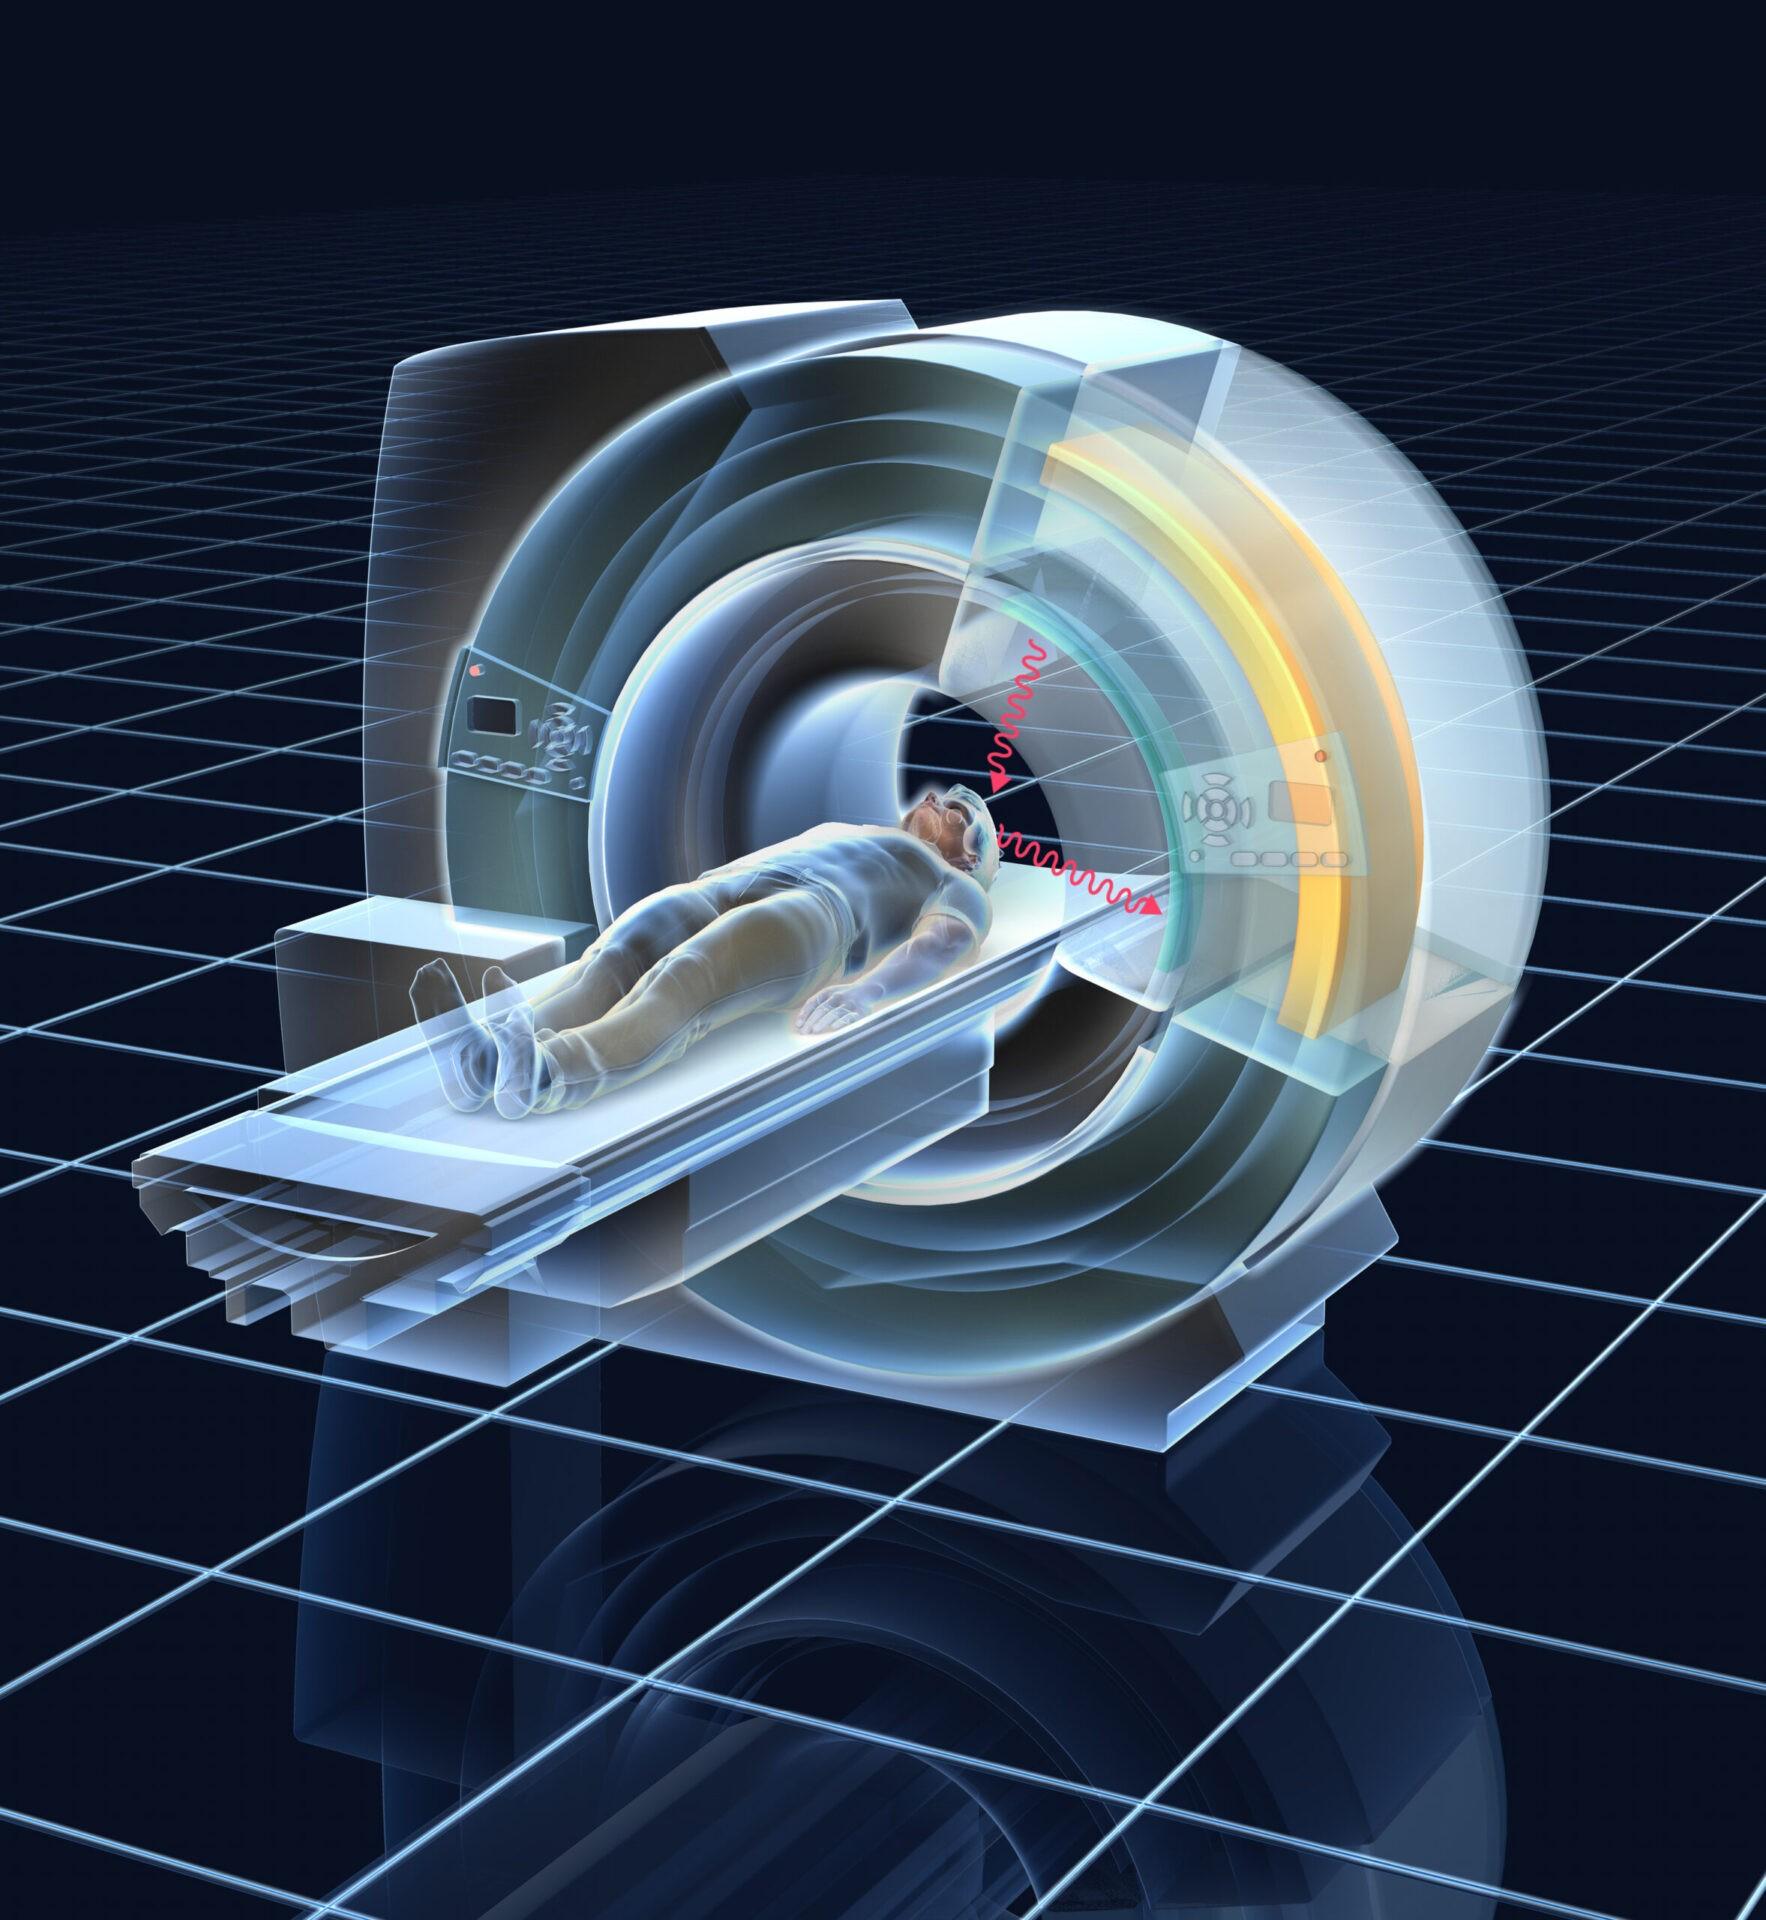 rezonans magnetyczny a tomografia komputerowa